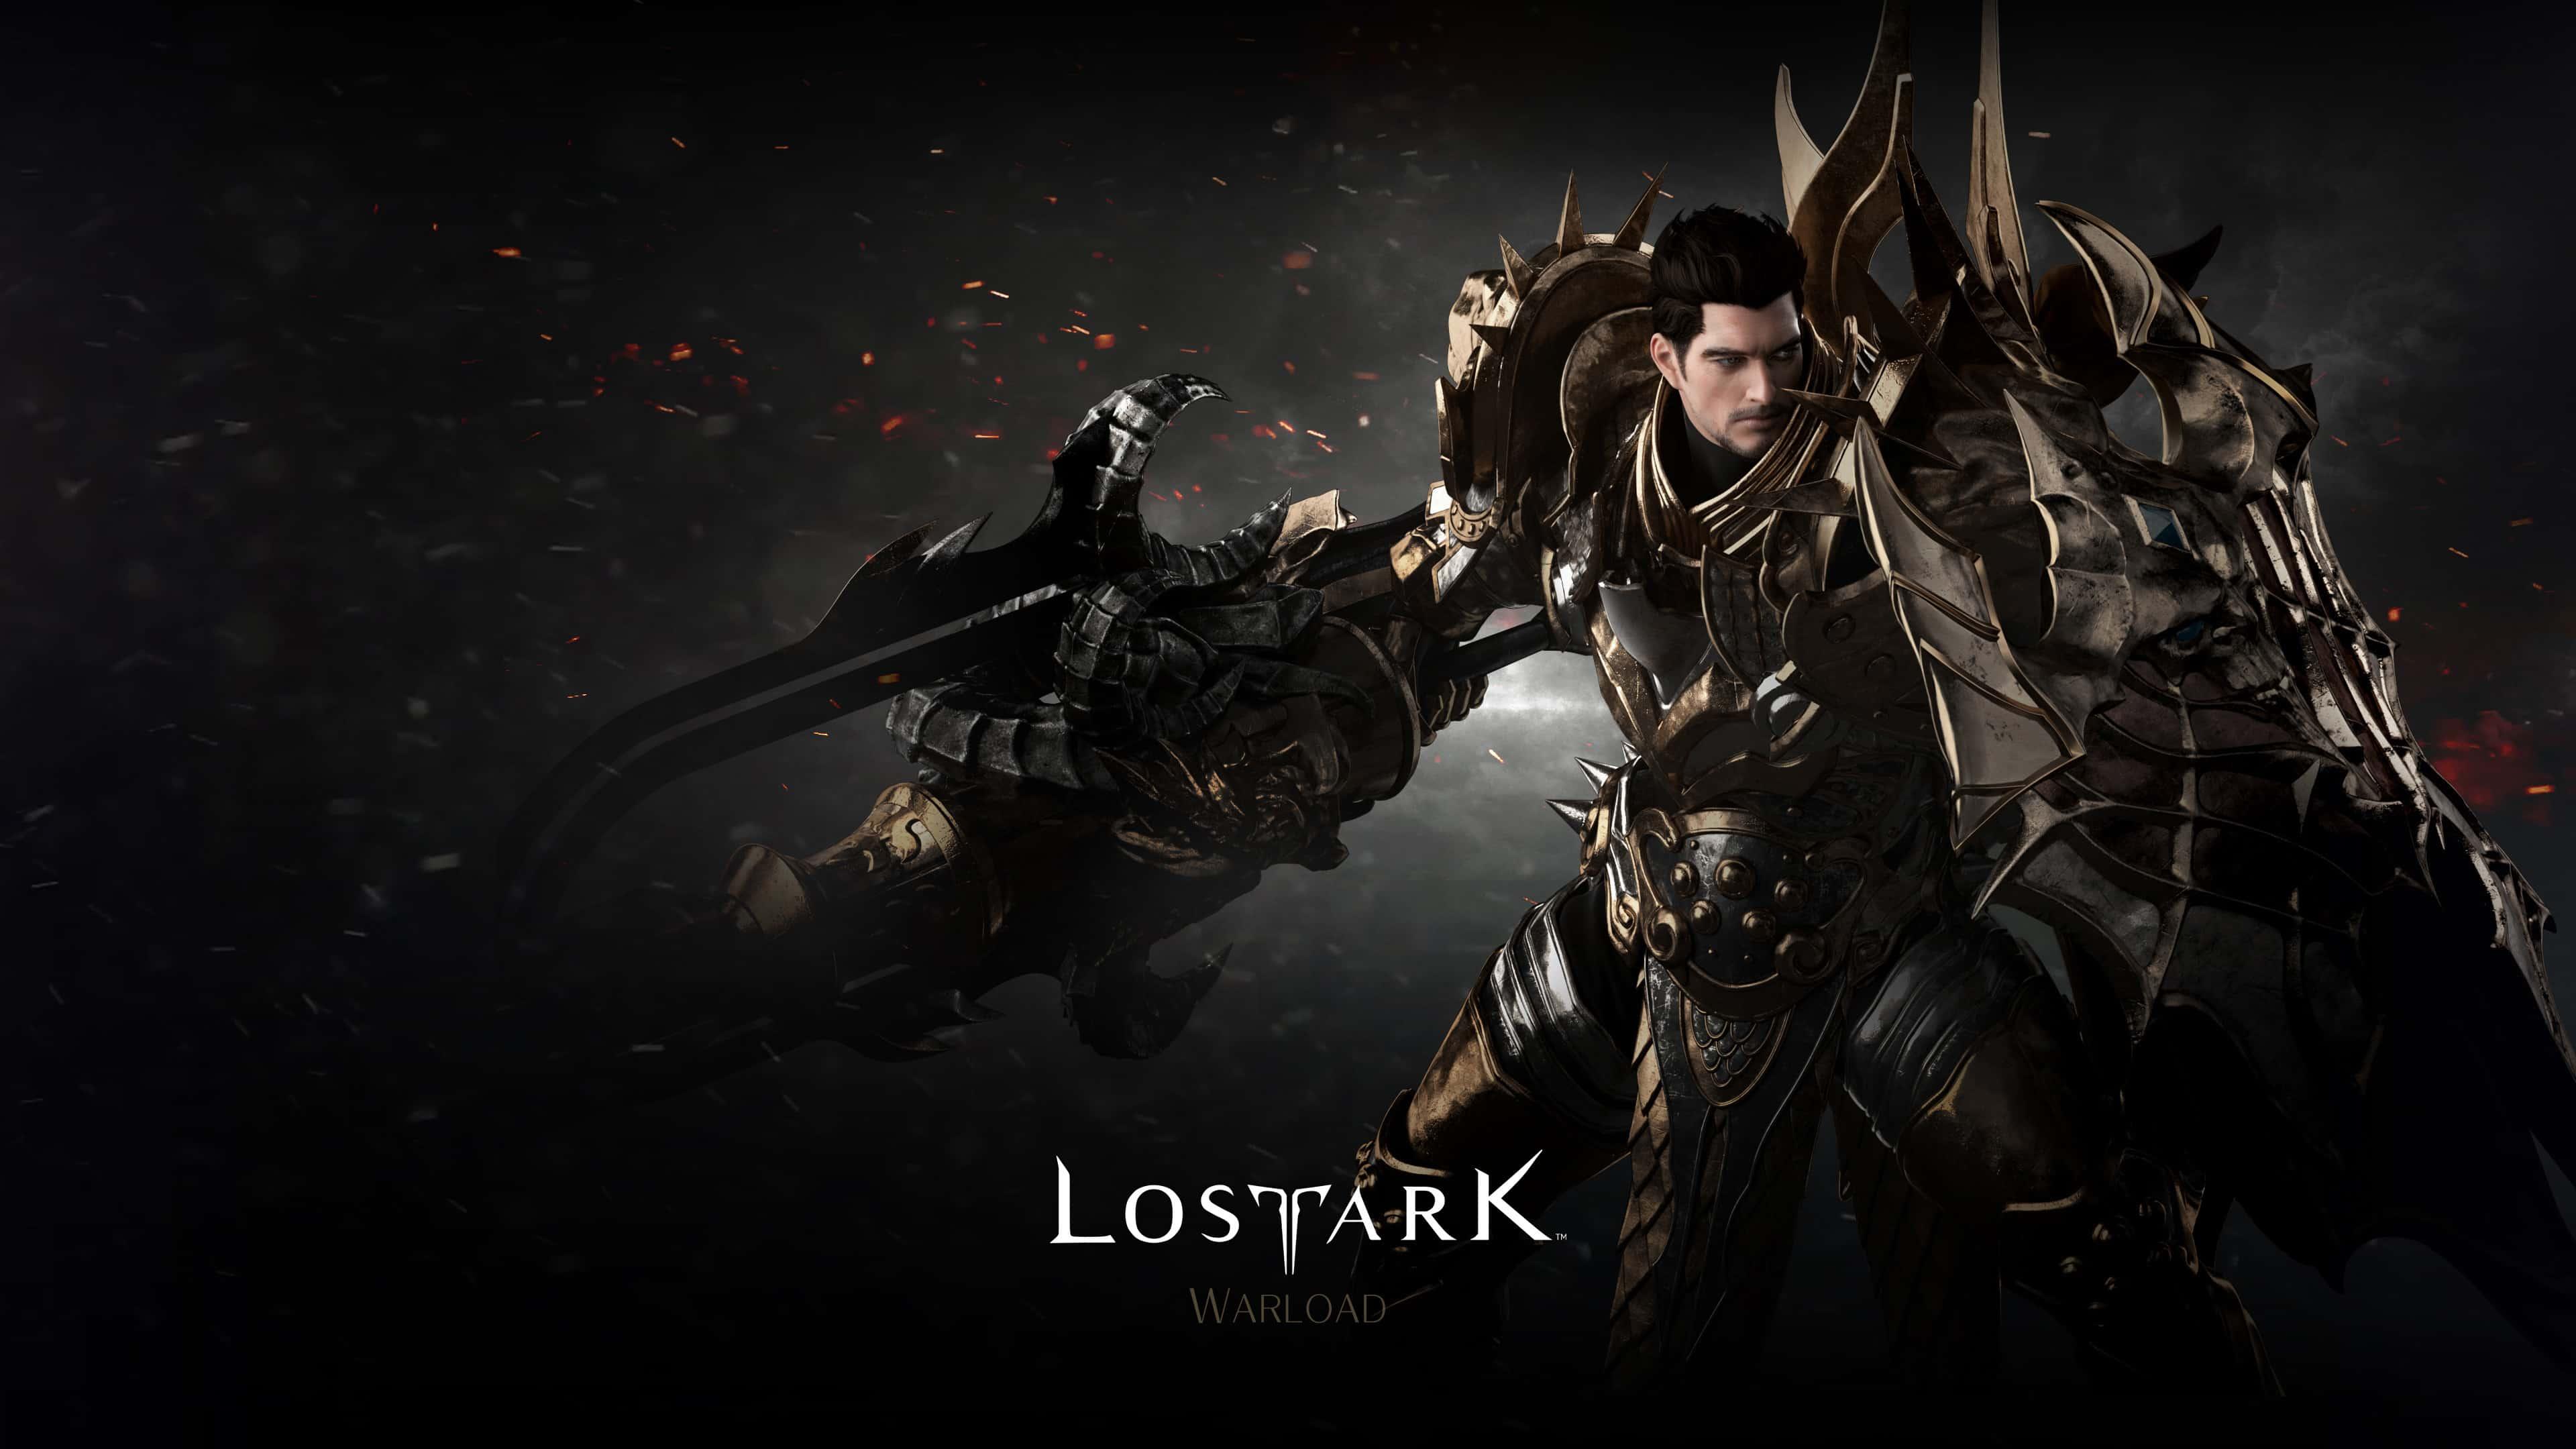 Lost Ark Warlord Uhd 4k Wallpaper Pixelz